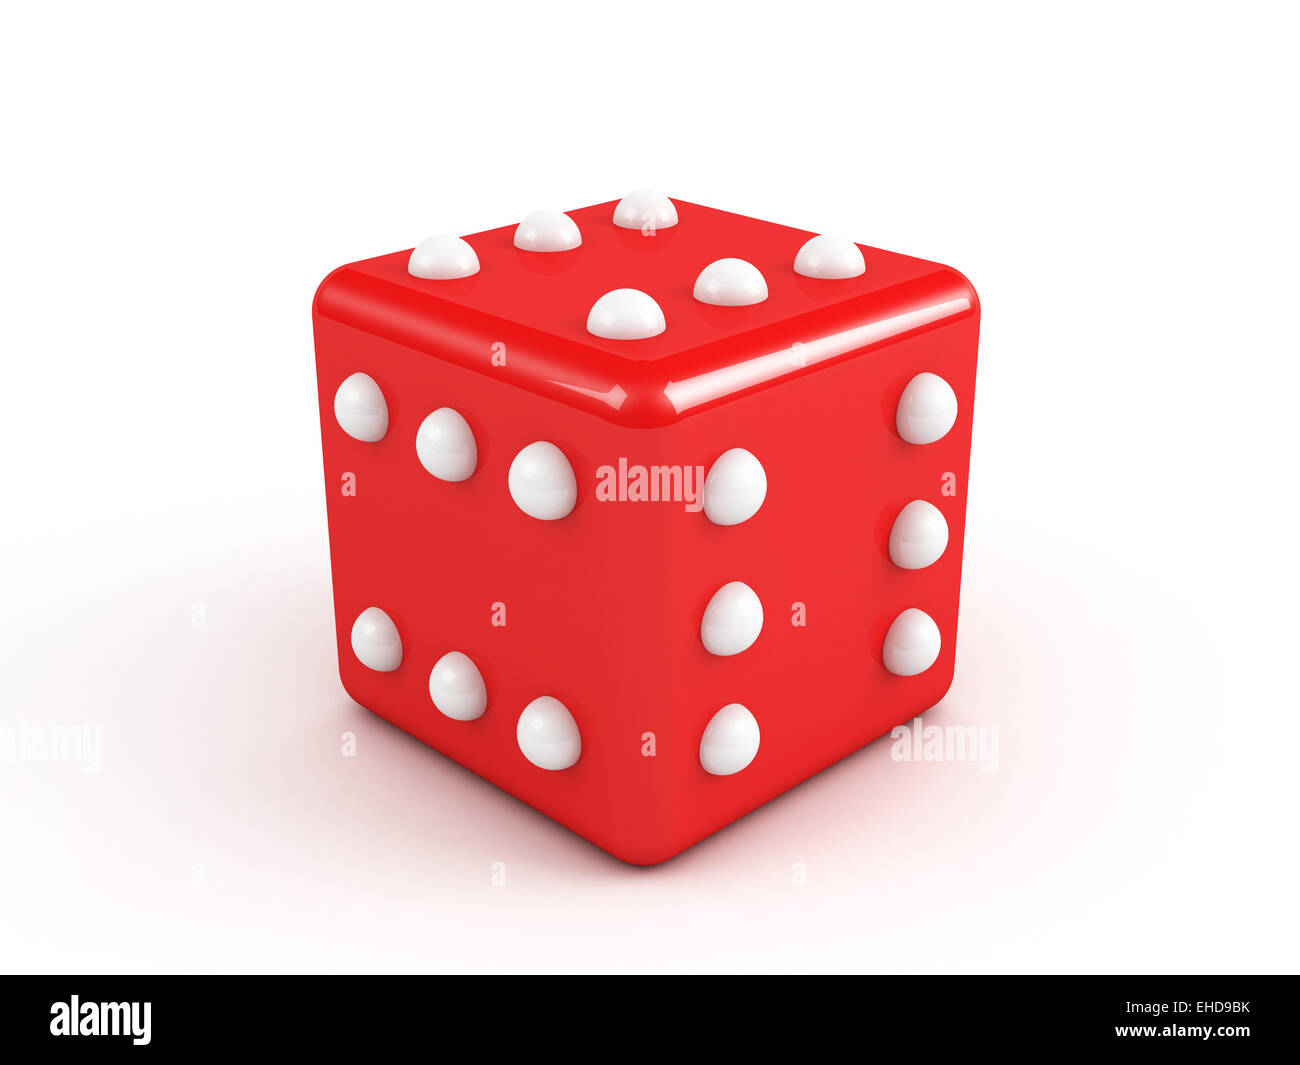 red winning dice - Stock Image